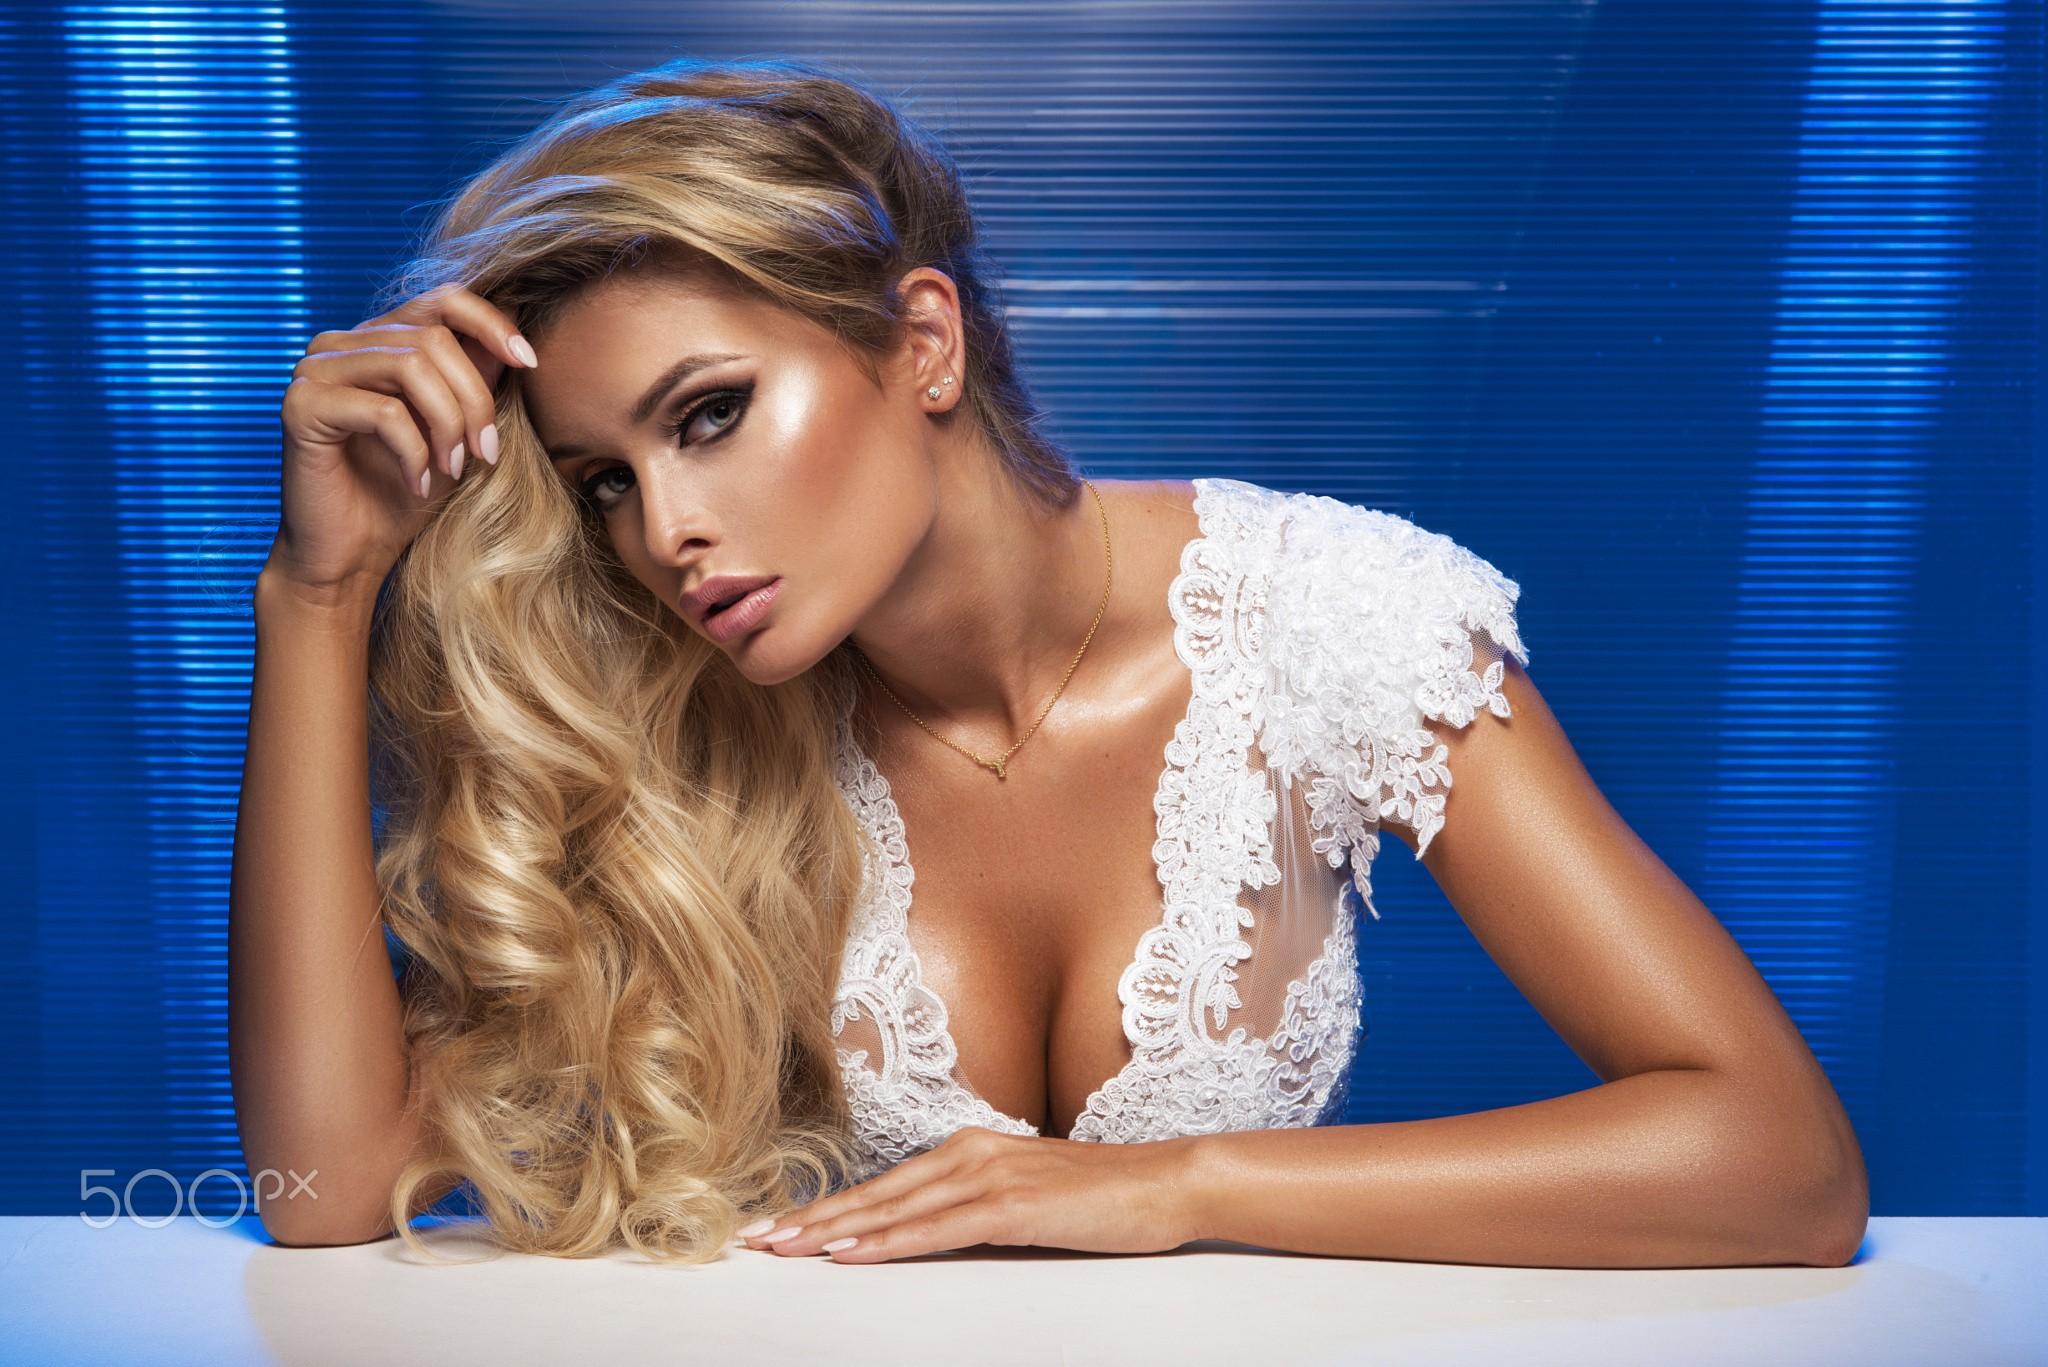 Wallpaper : women, model, blonde, long hair, French